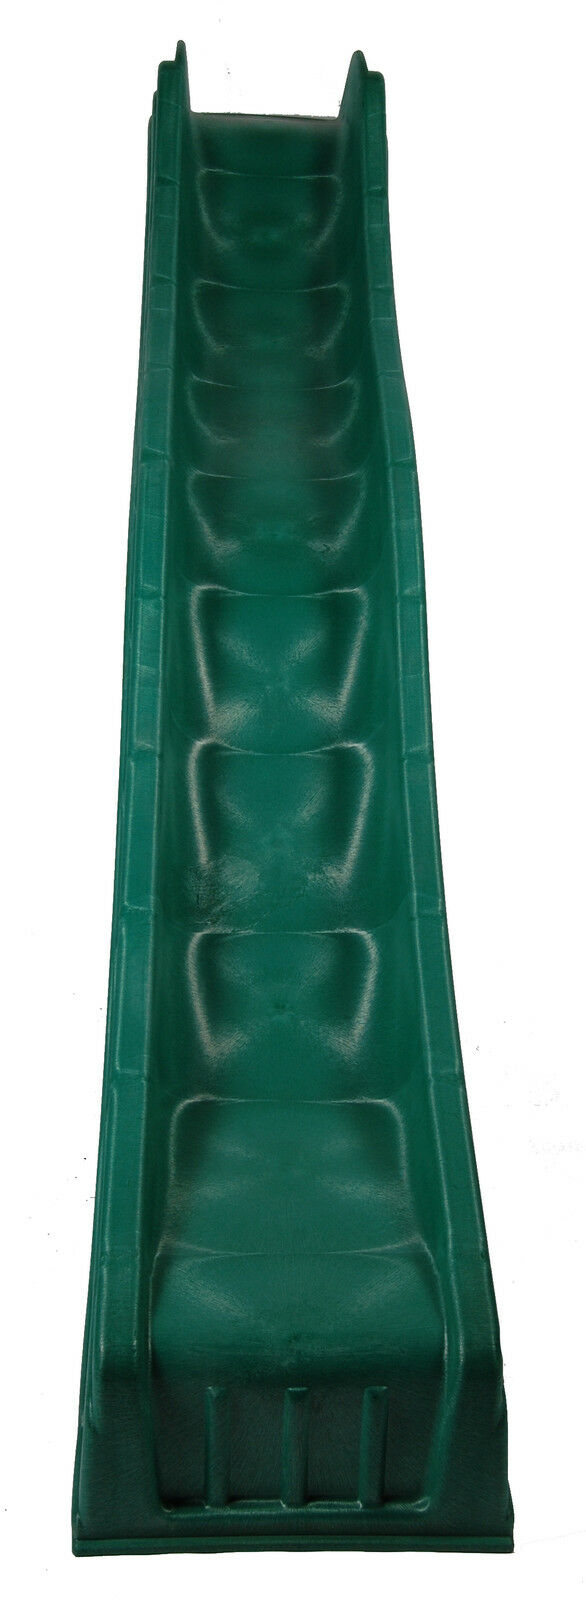 7ft,2.1 Metro Dei Bambini Resistente verde verde verde Ondulato Scivolo,Arrampicata Telaio 0ed53b